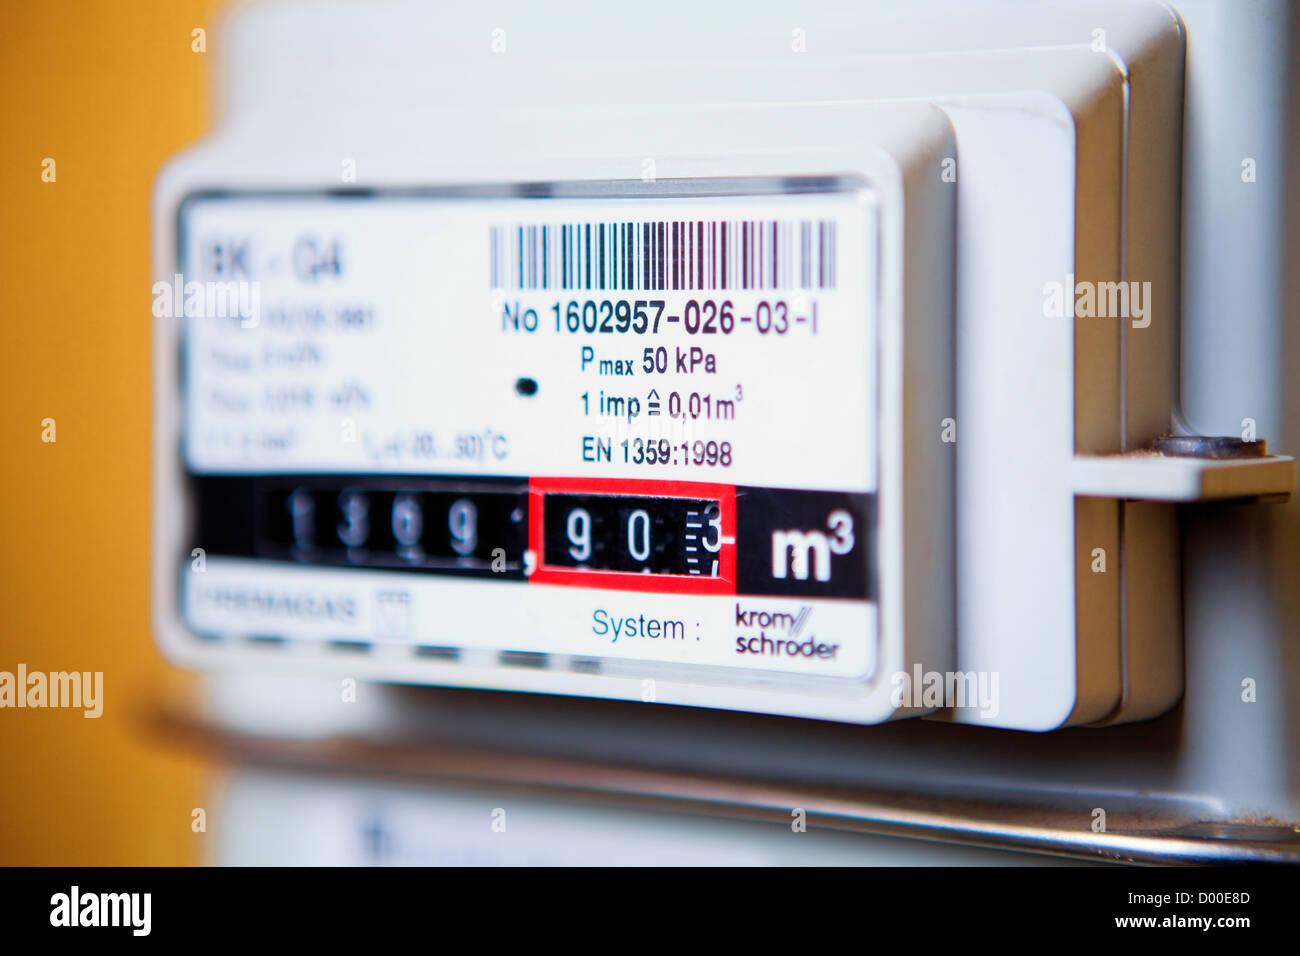 closeup of a gas meter in Czech Republic - Stock Image